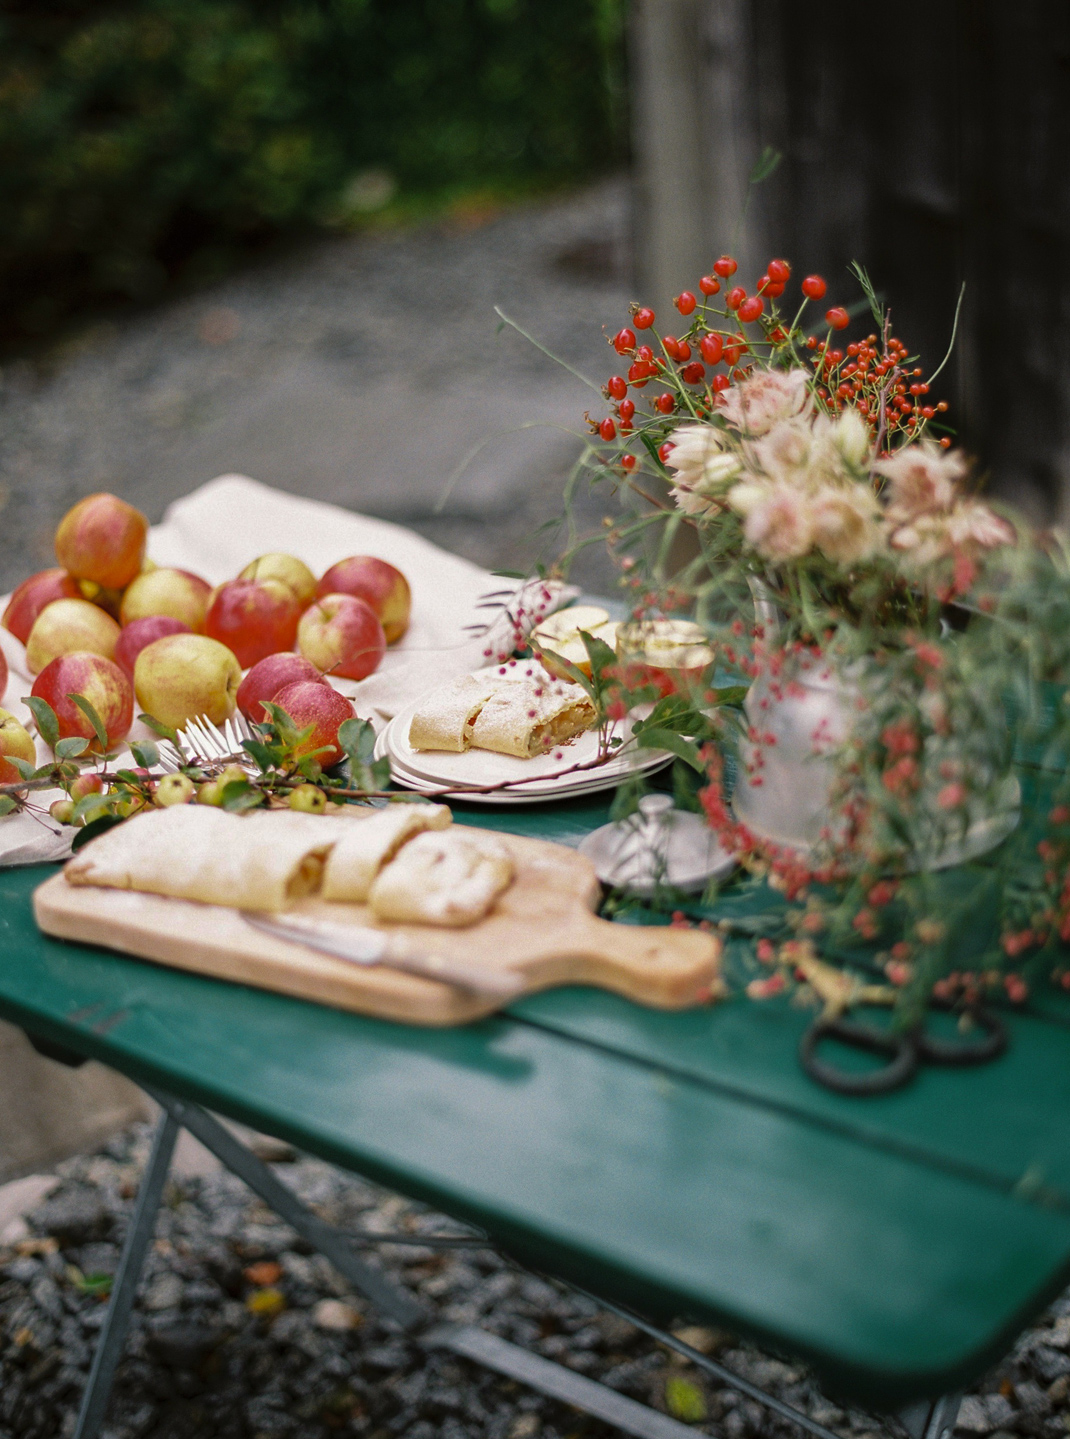 Silvia Fischer. Echte Kuchenliebe. Apfelschlangerl Rezept Foodblog